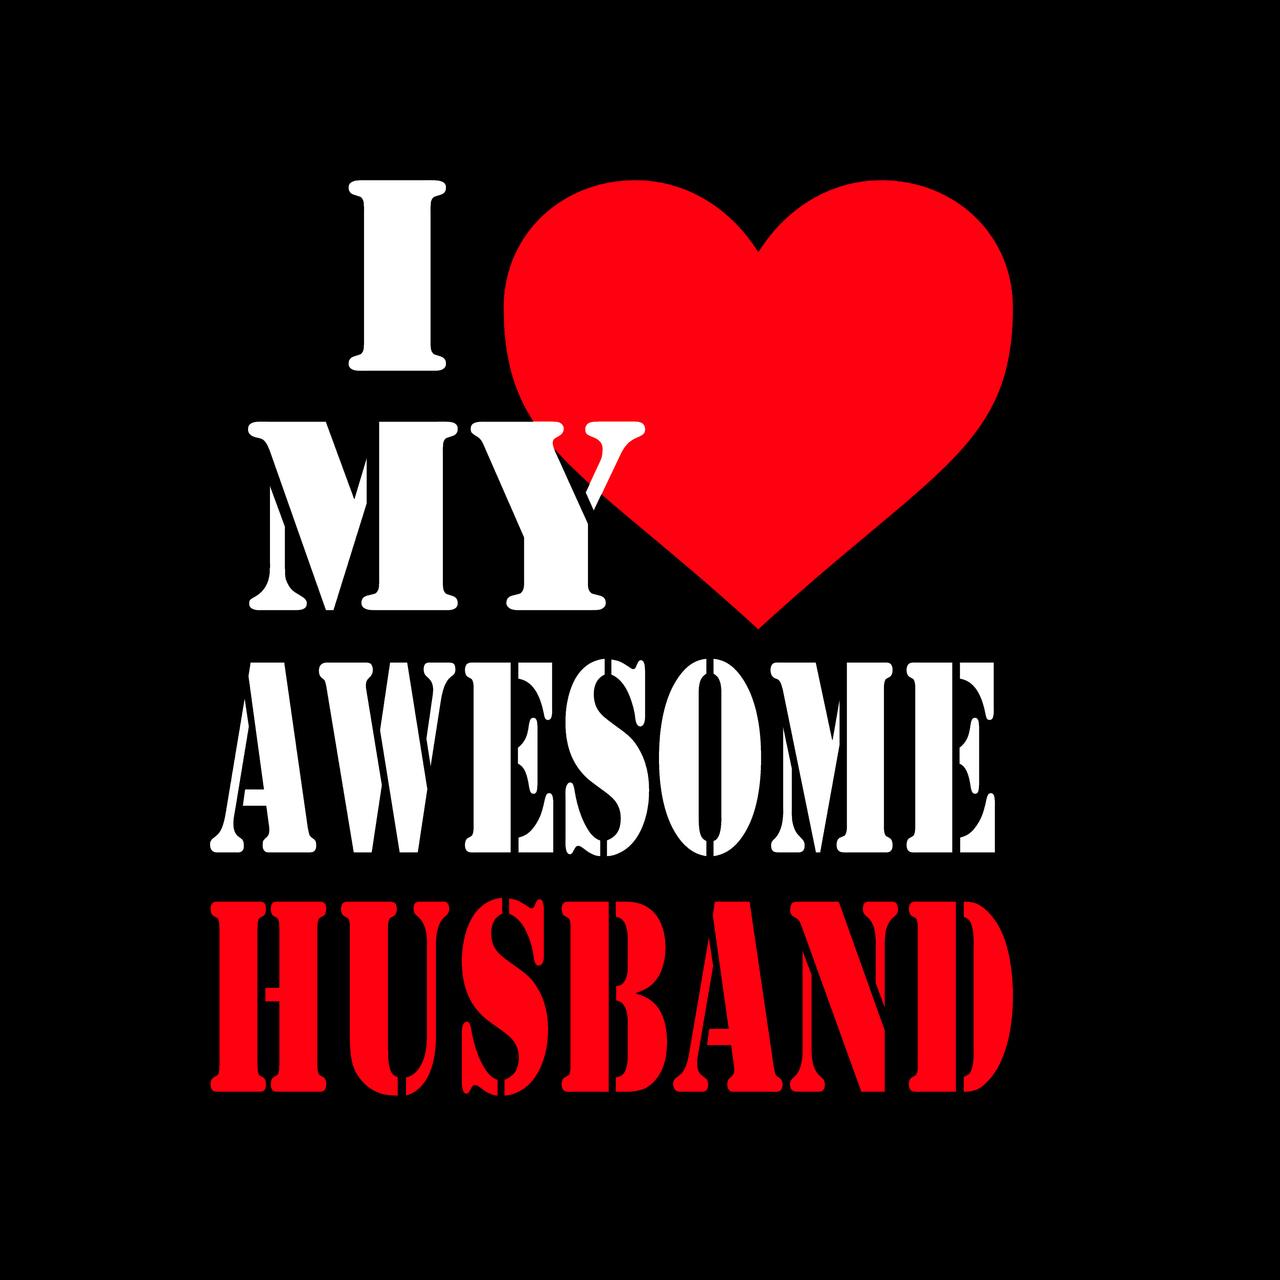 I Love My Husband Wallpaper wwwgalleryhipcom   The 1280x1280